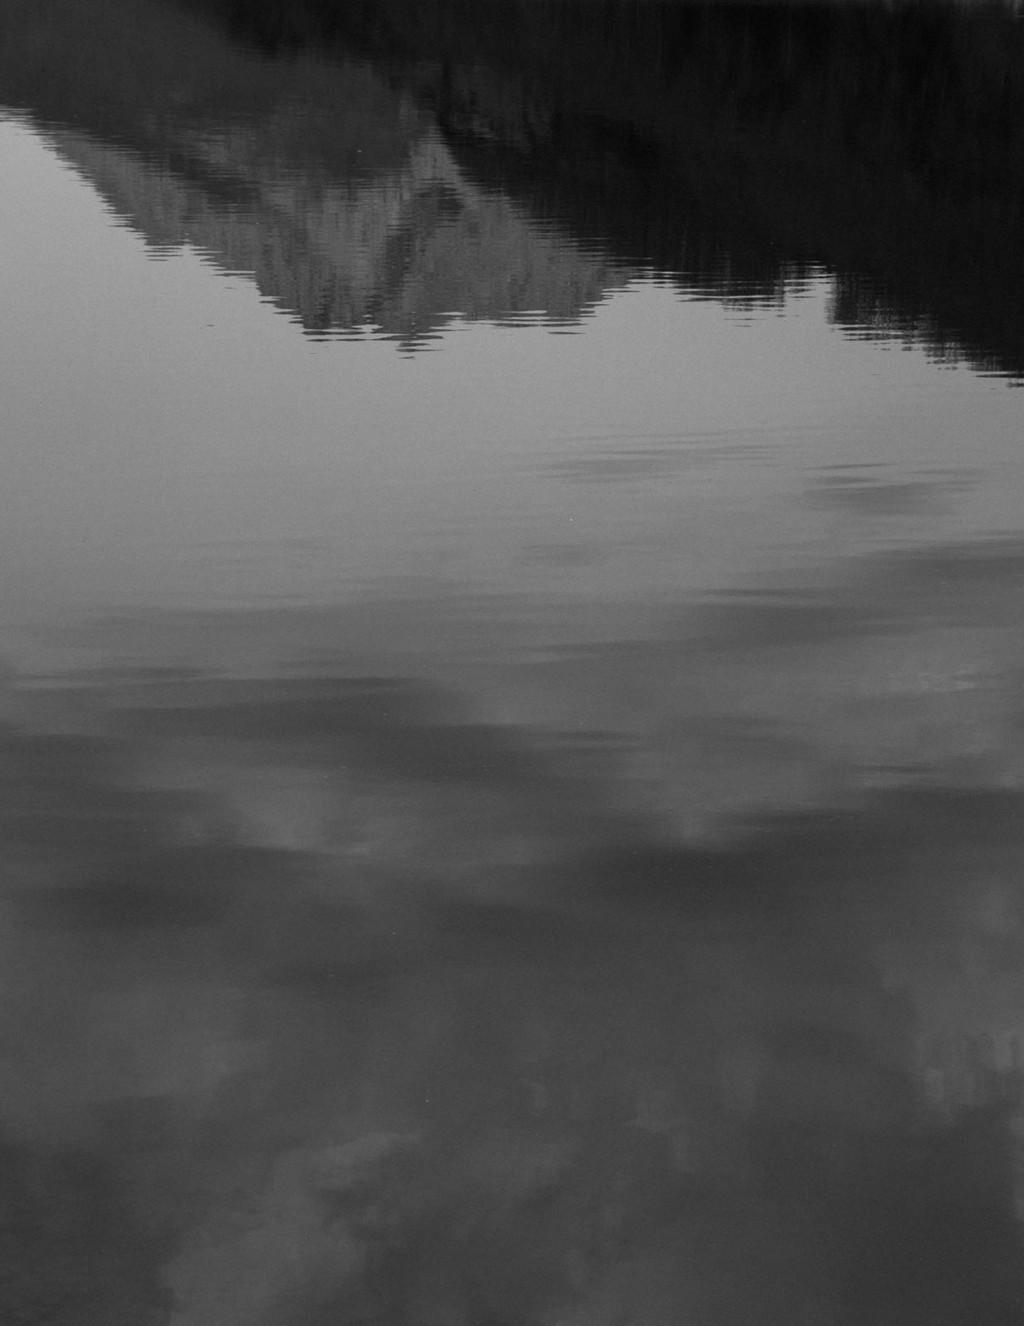 Continu-um; a photographic duo. 10. May 2017